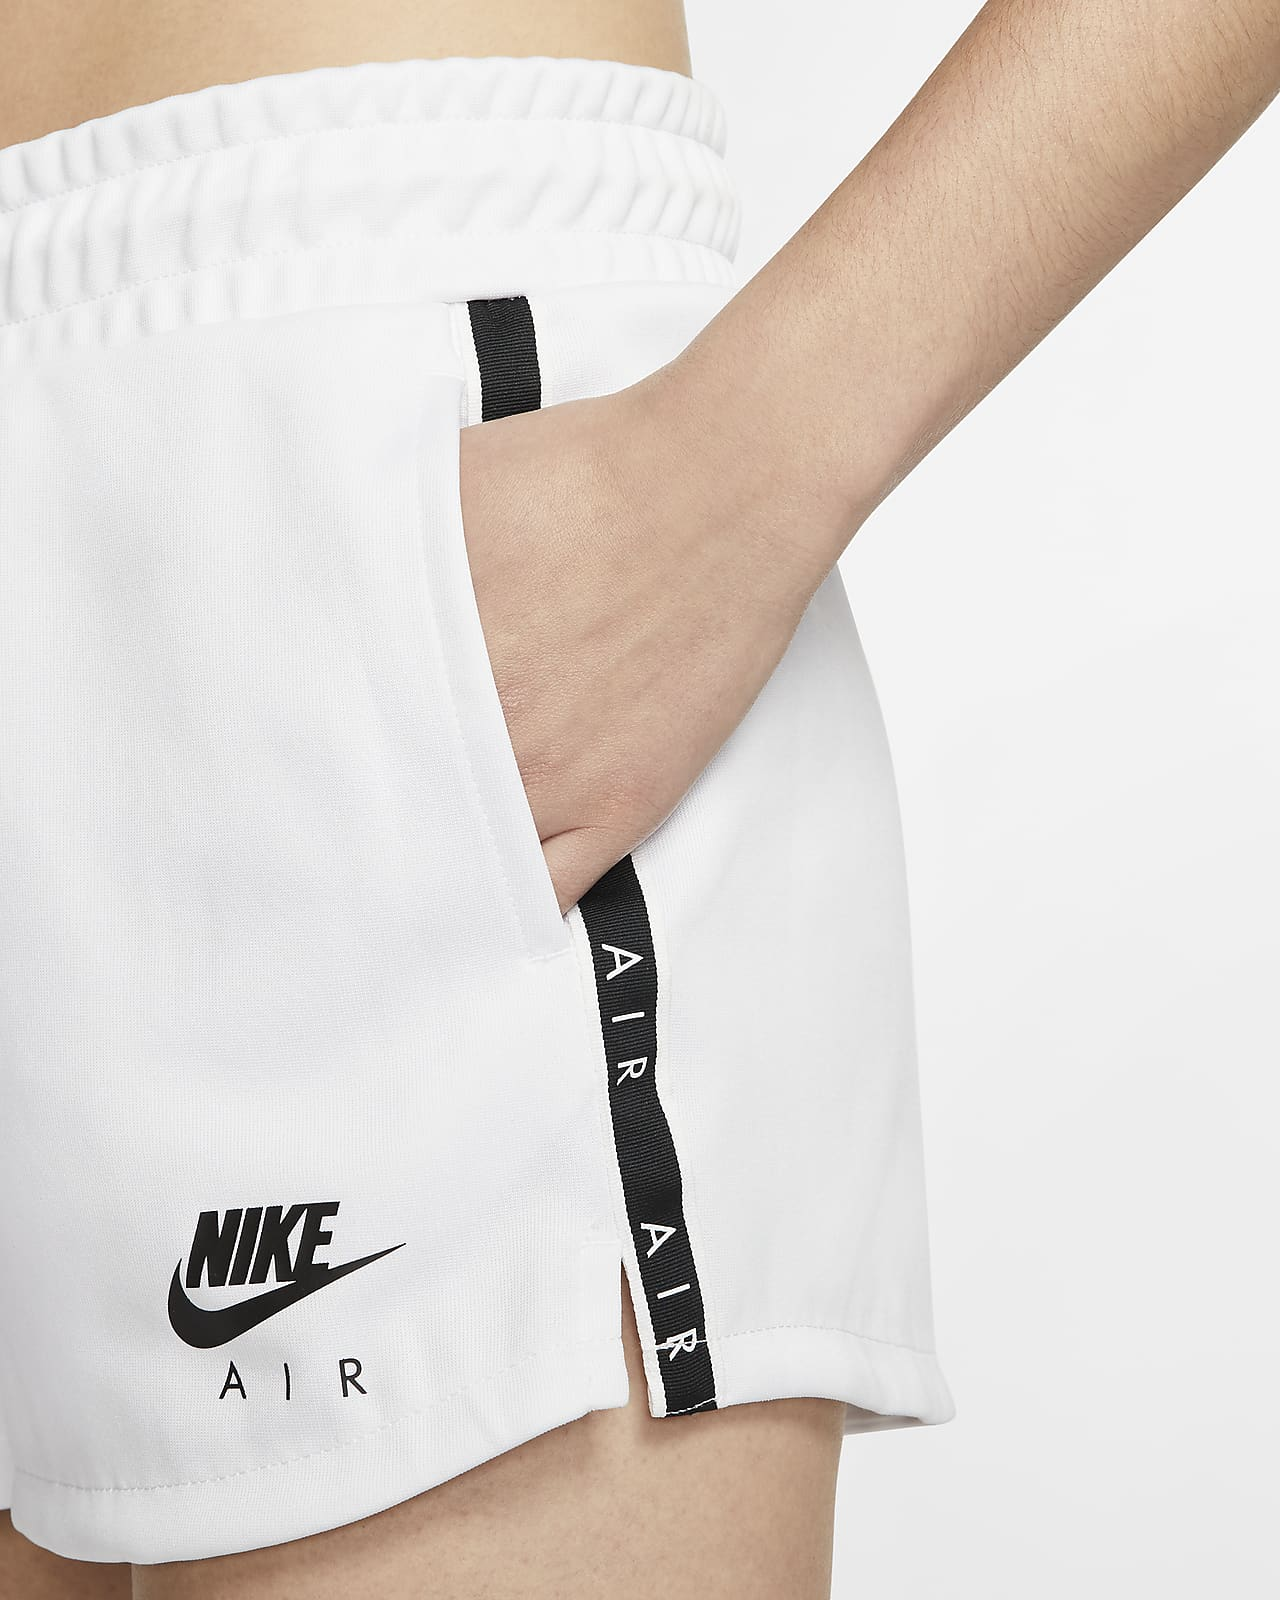 Nike Air Women's Shorts. Nike ZA